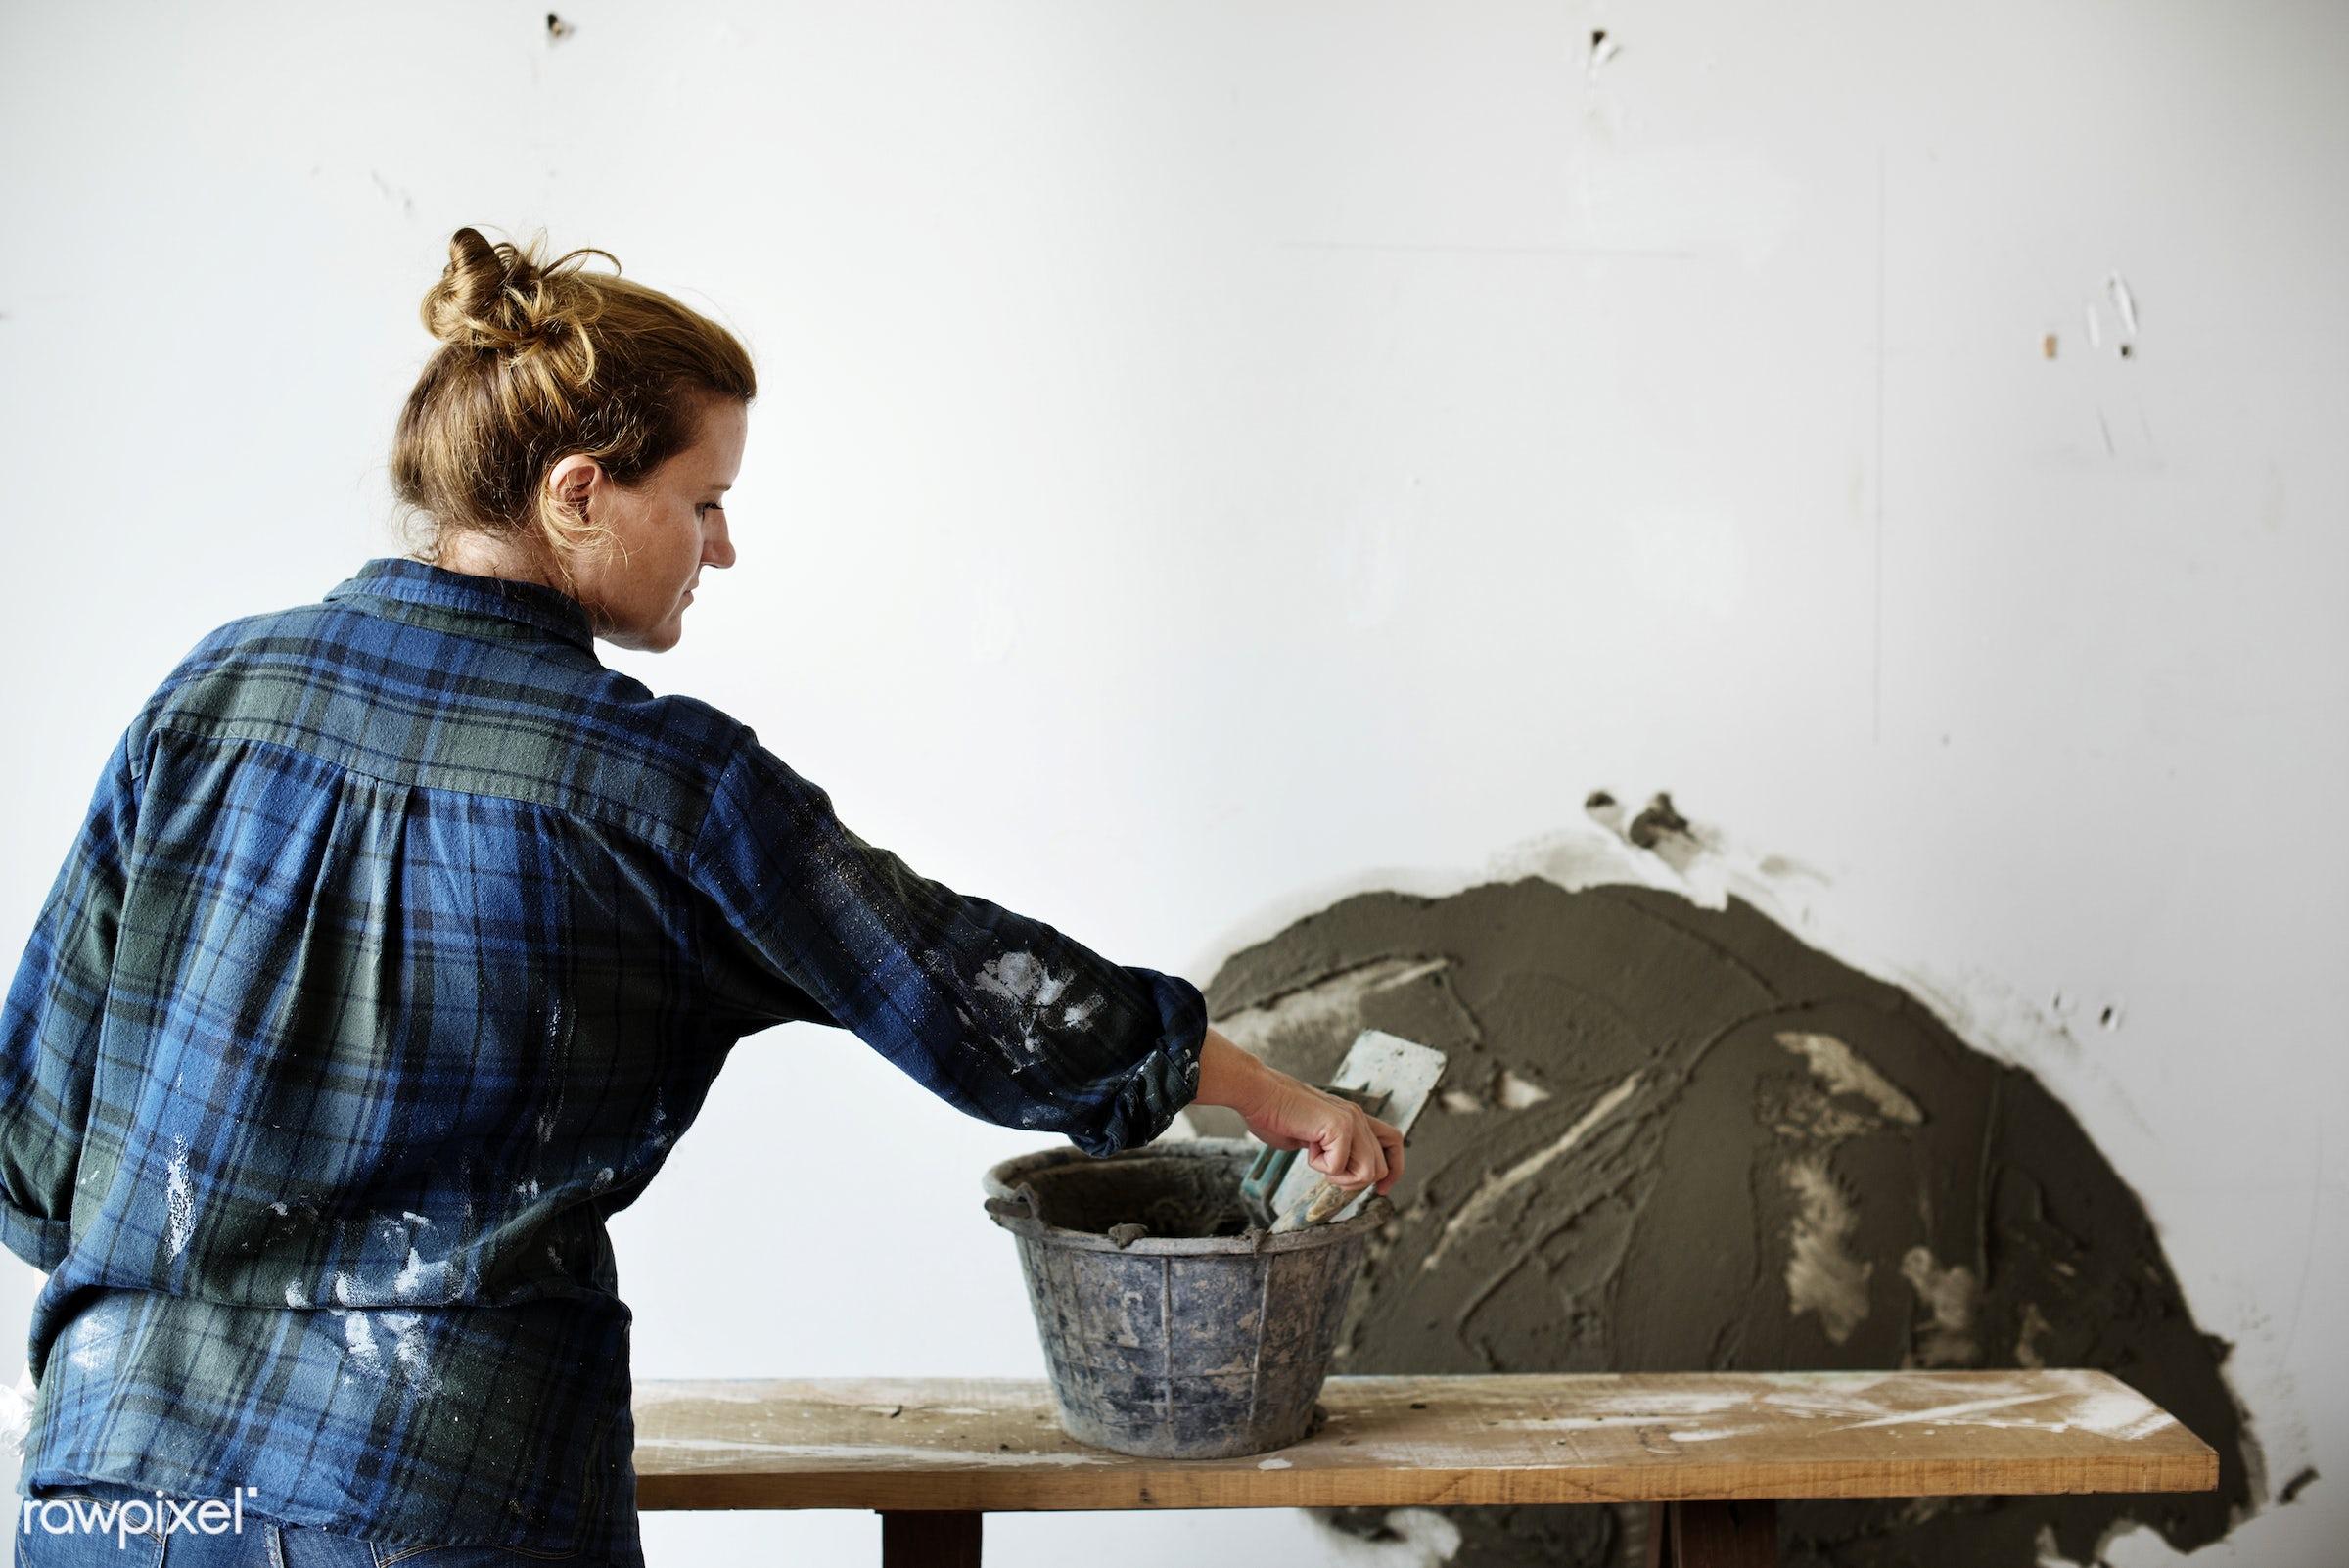 indoor, tool, equipment, grout, woman, plaster, mortar, worker, repair, cement, renovation, construction, work, plastering,...